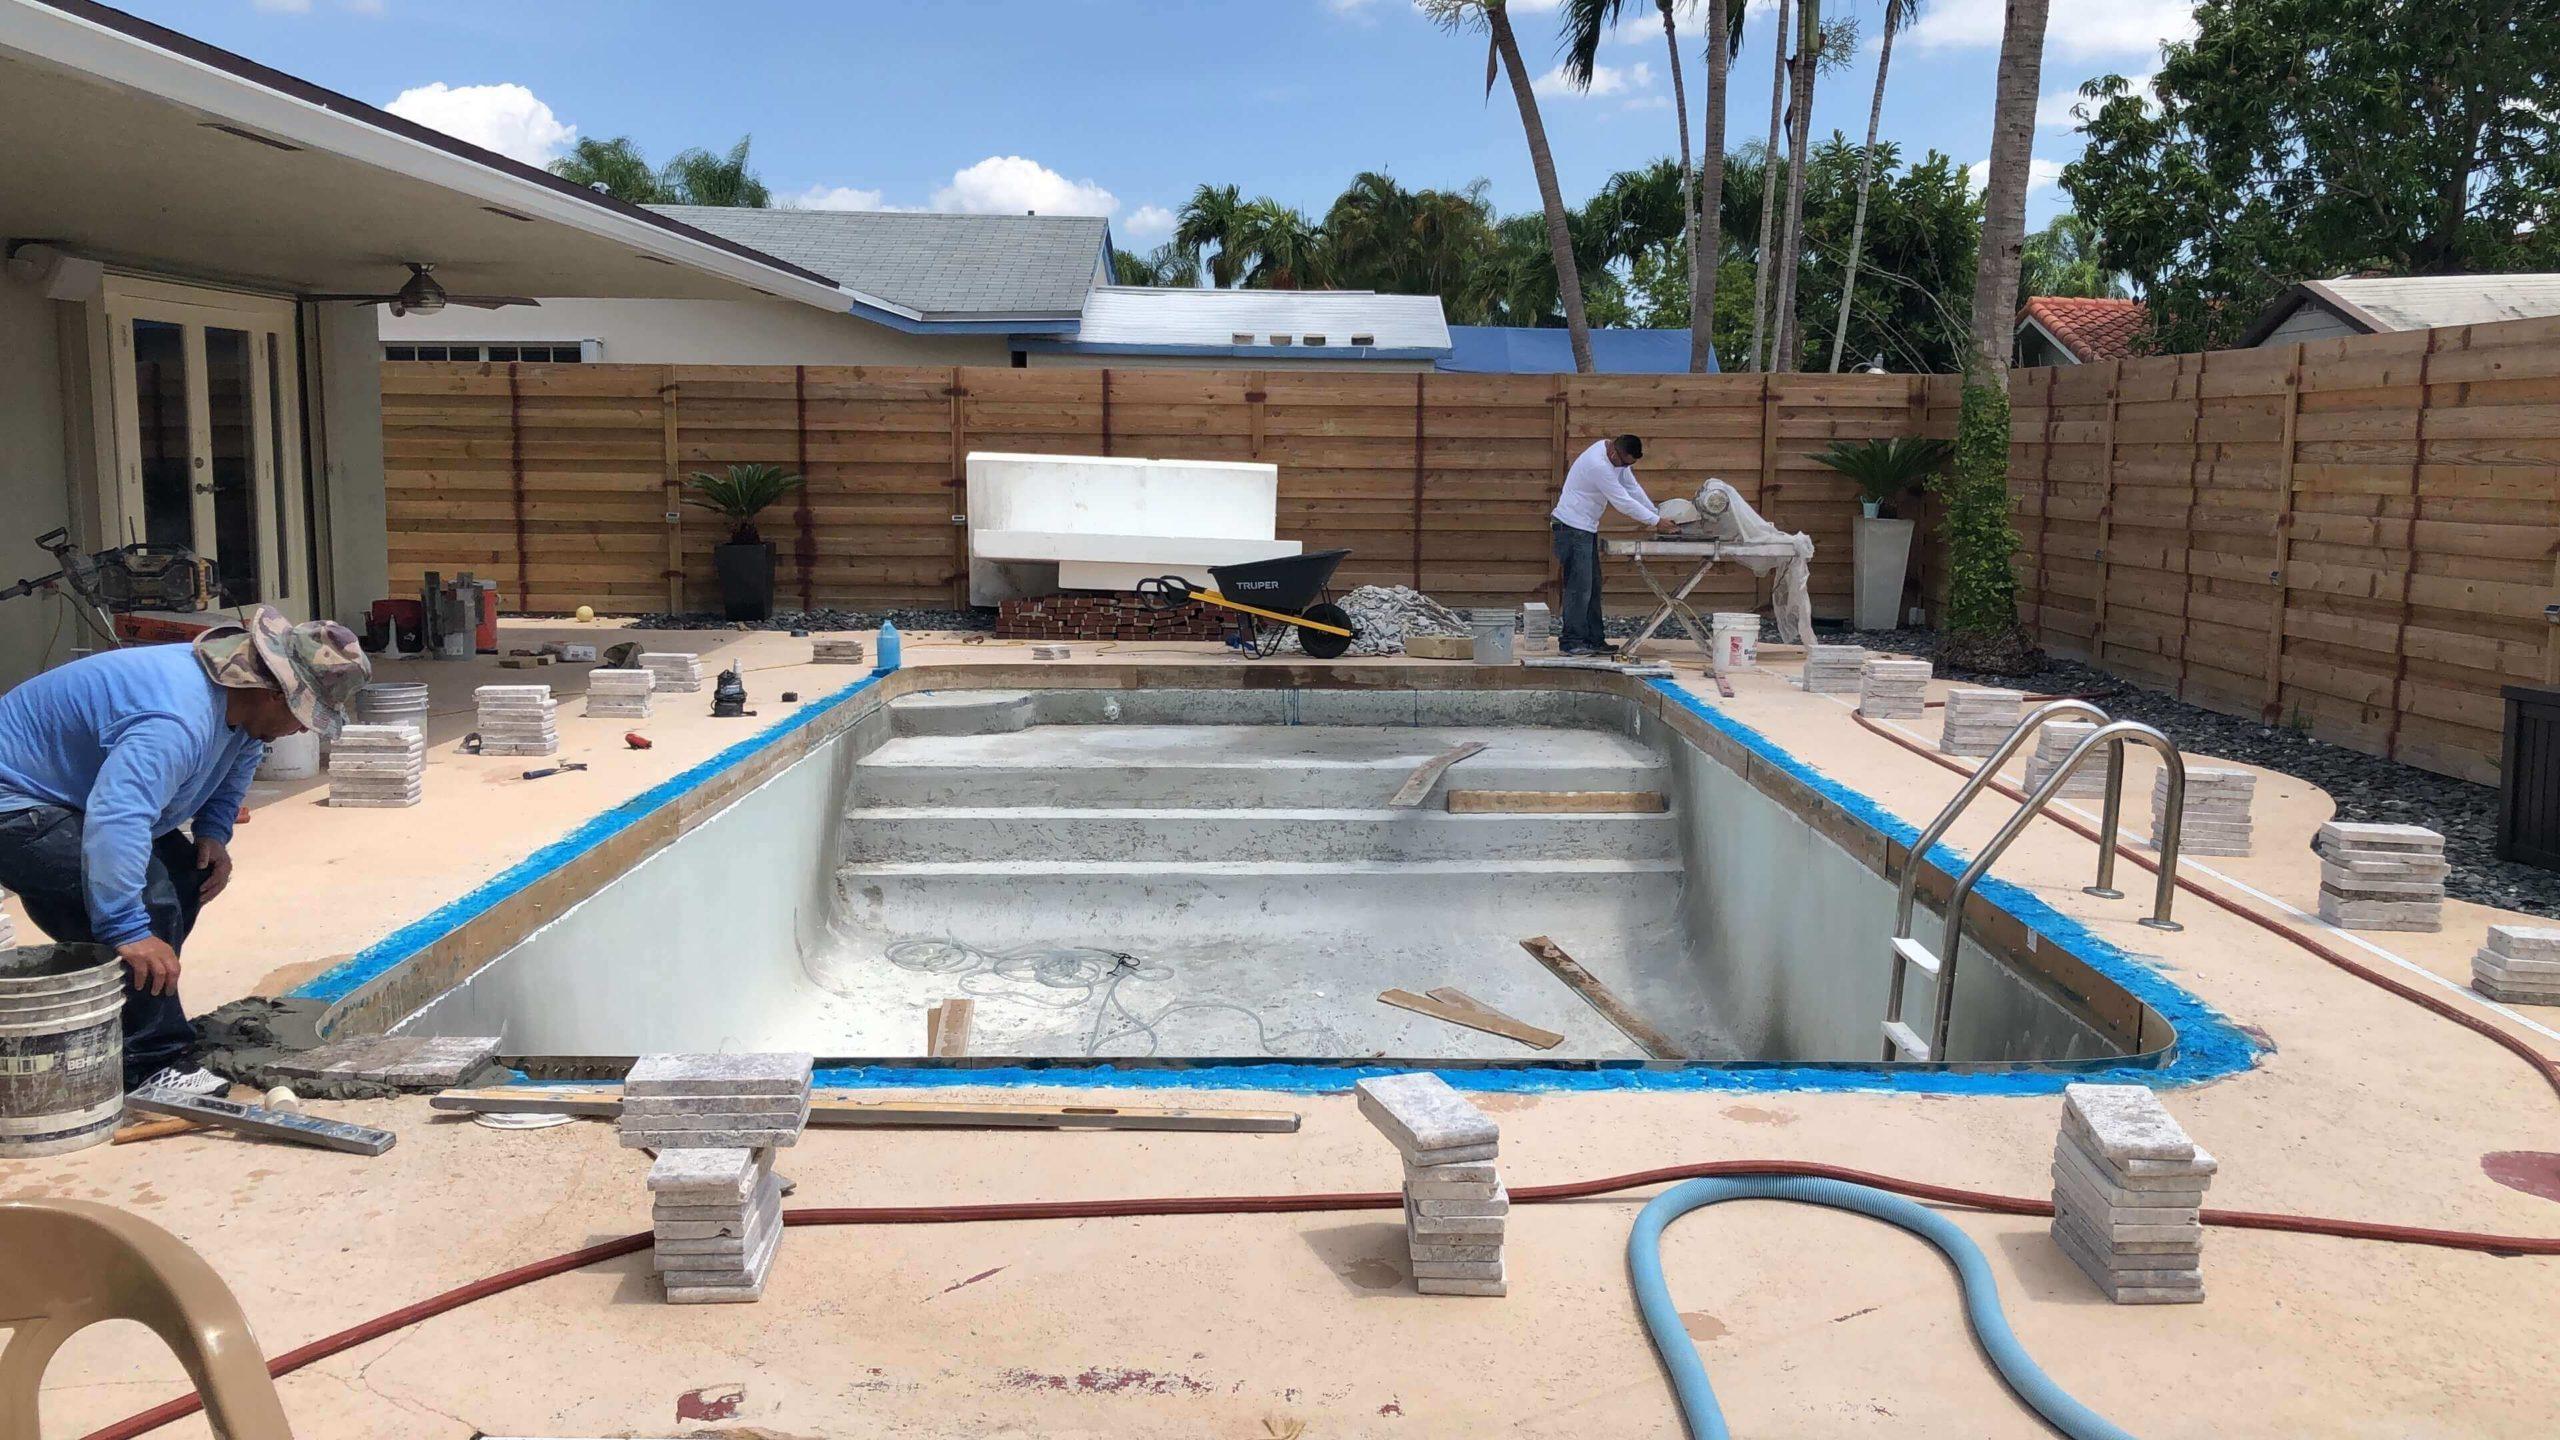 people working on pool remodeling